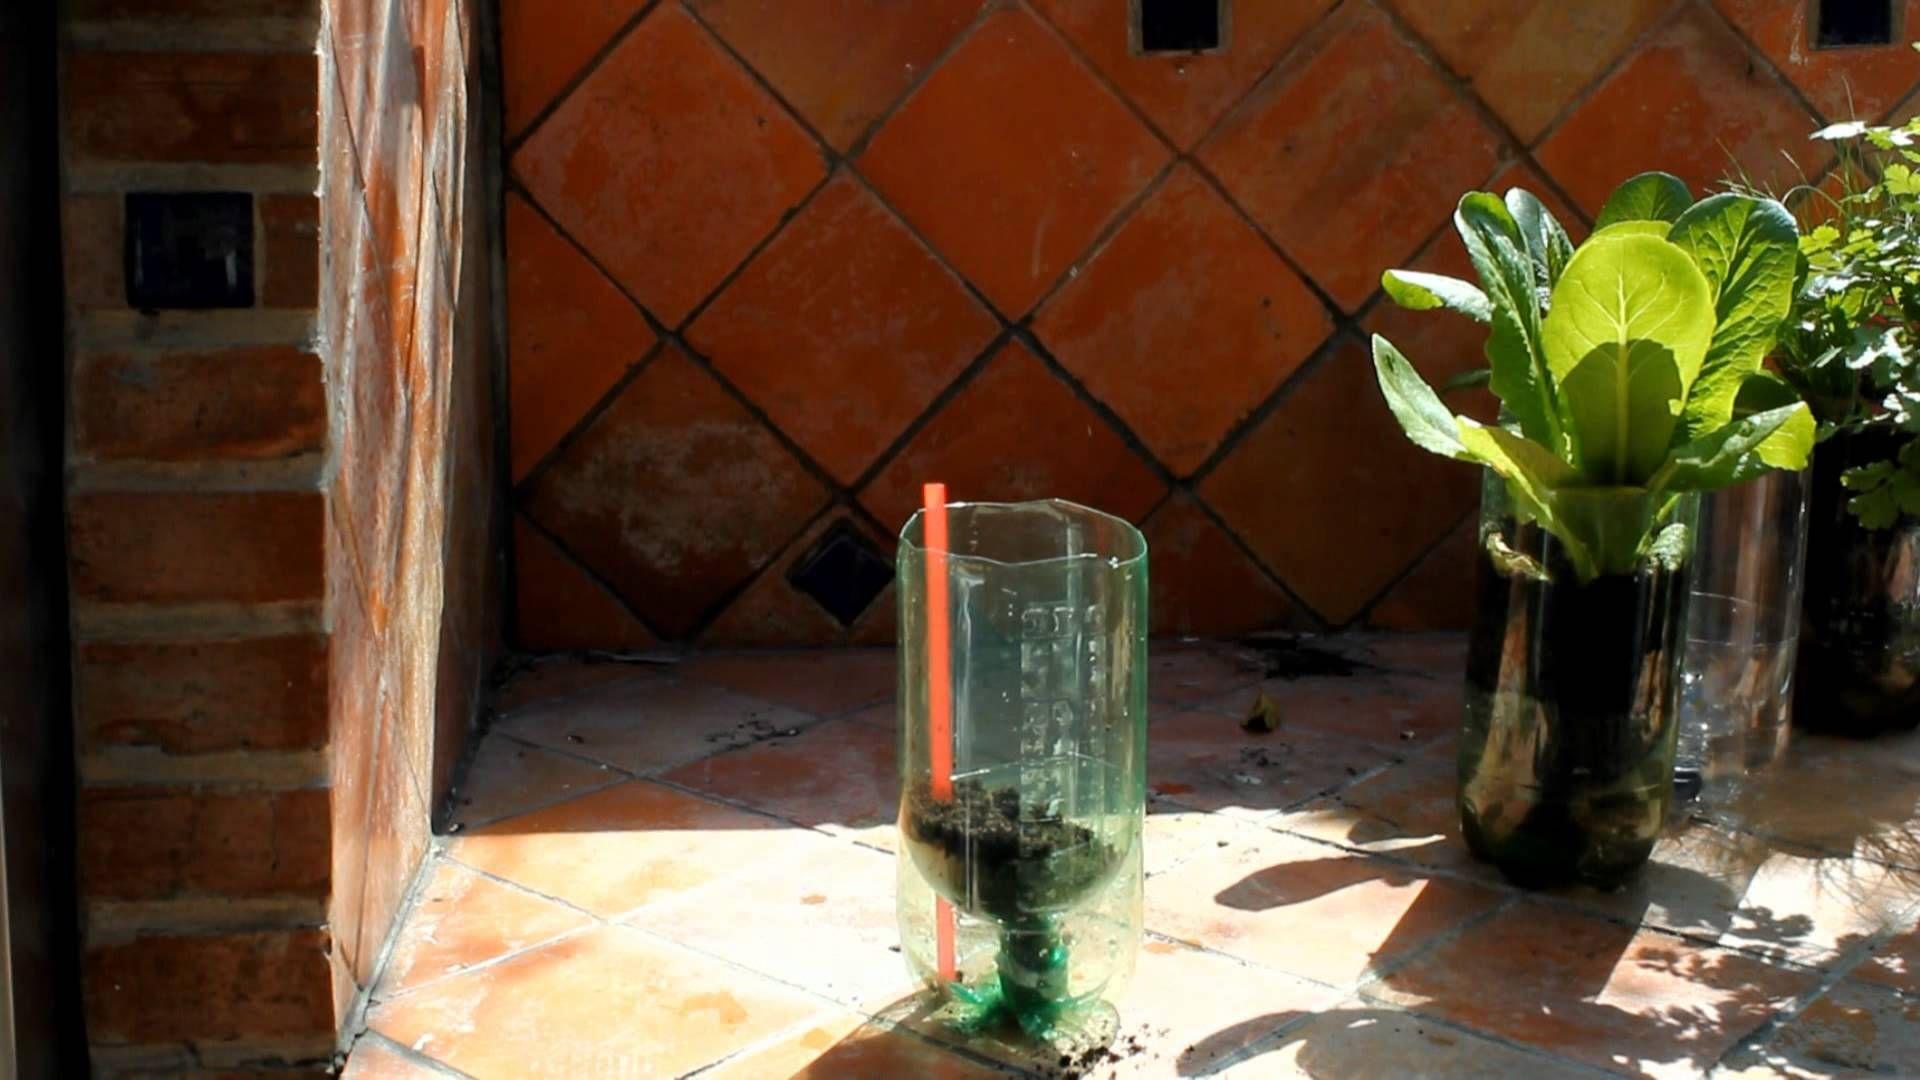 Building a soda bottle garden.wmv | Garden-Structures | Pinterest ...